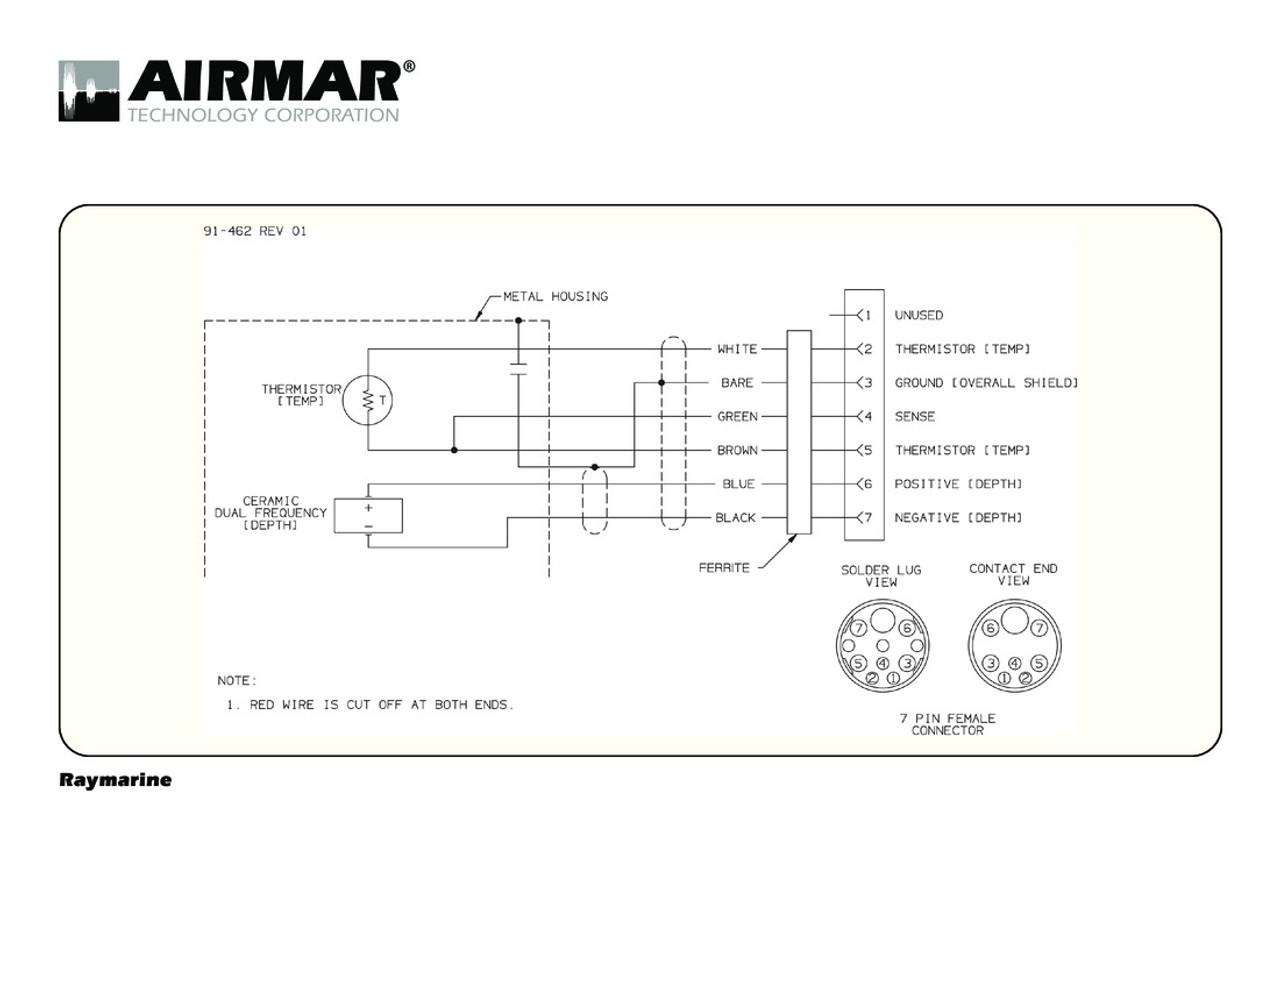 raymarine radar wiring diagram wiring rh westpol co Raymarine Transducer Wiring Boat Wiring Schematics